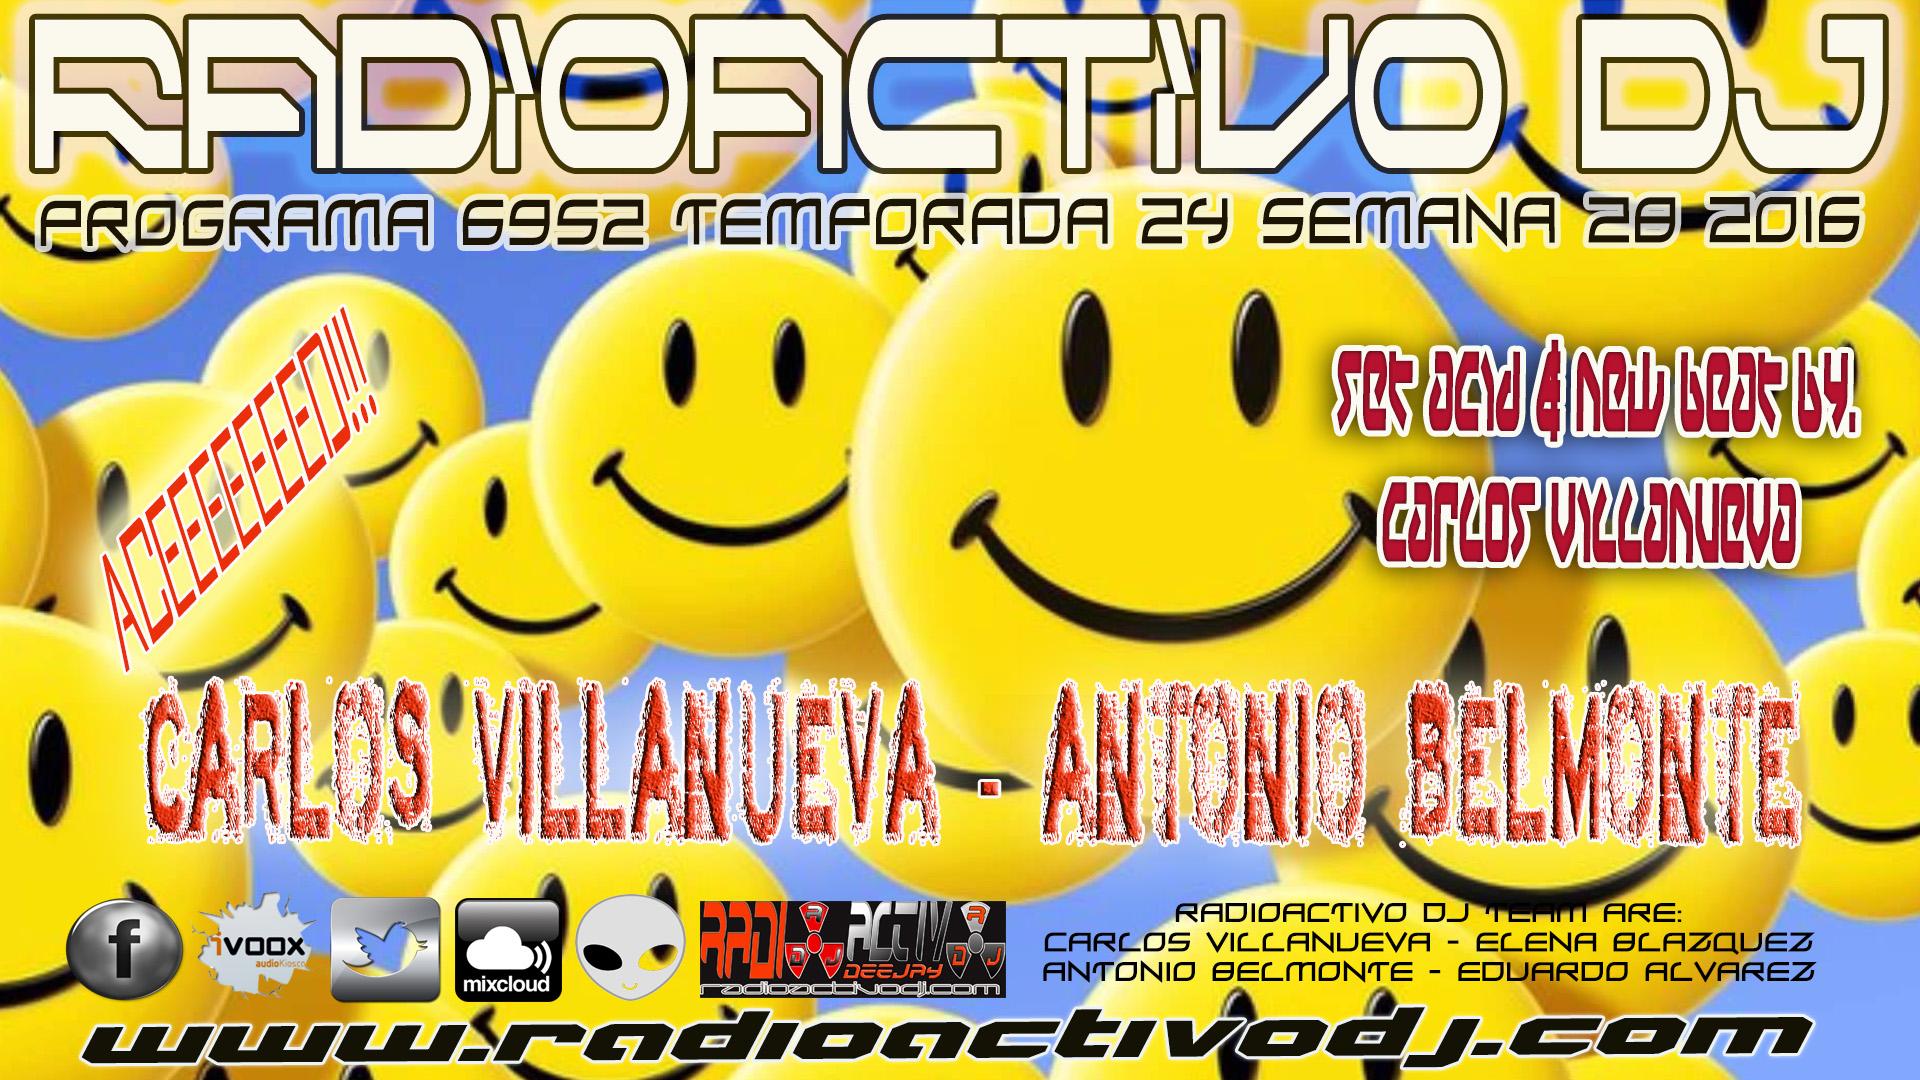 RADIOACTIVO DJ 28-2016